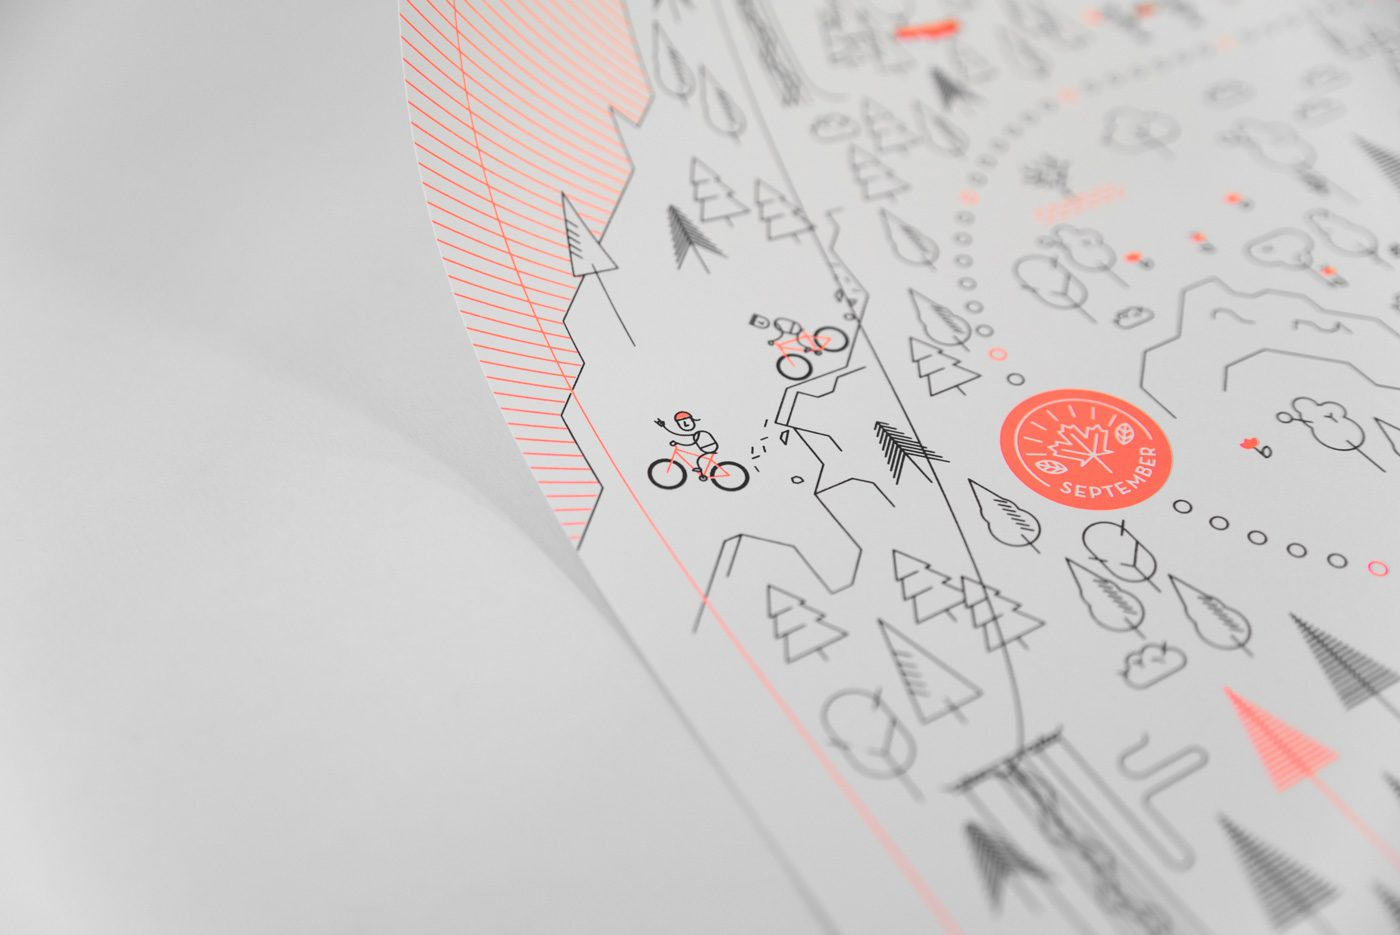 upstruct calendar 2018 - bikers